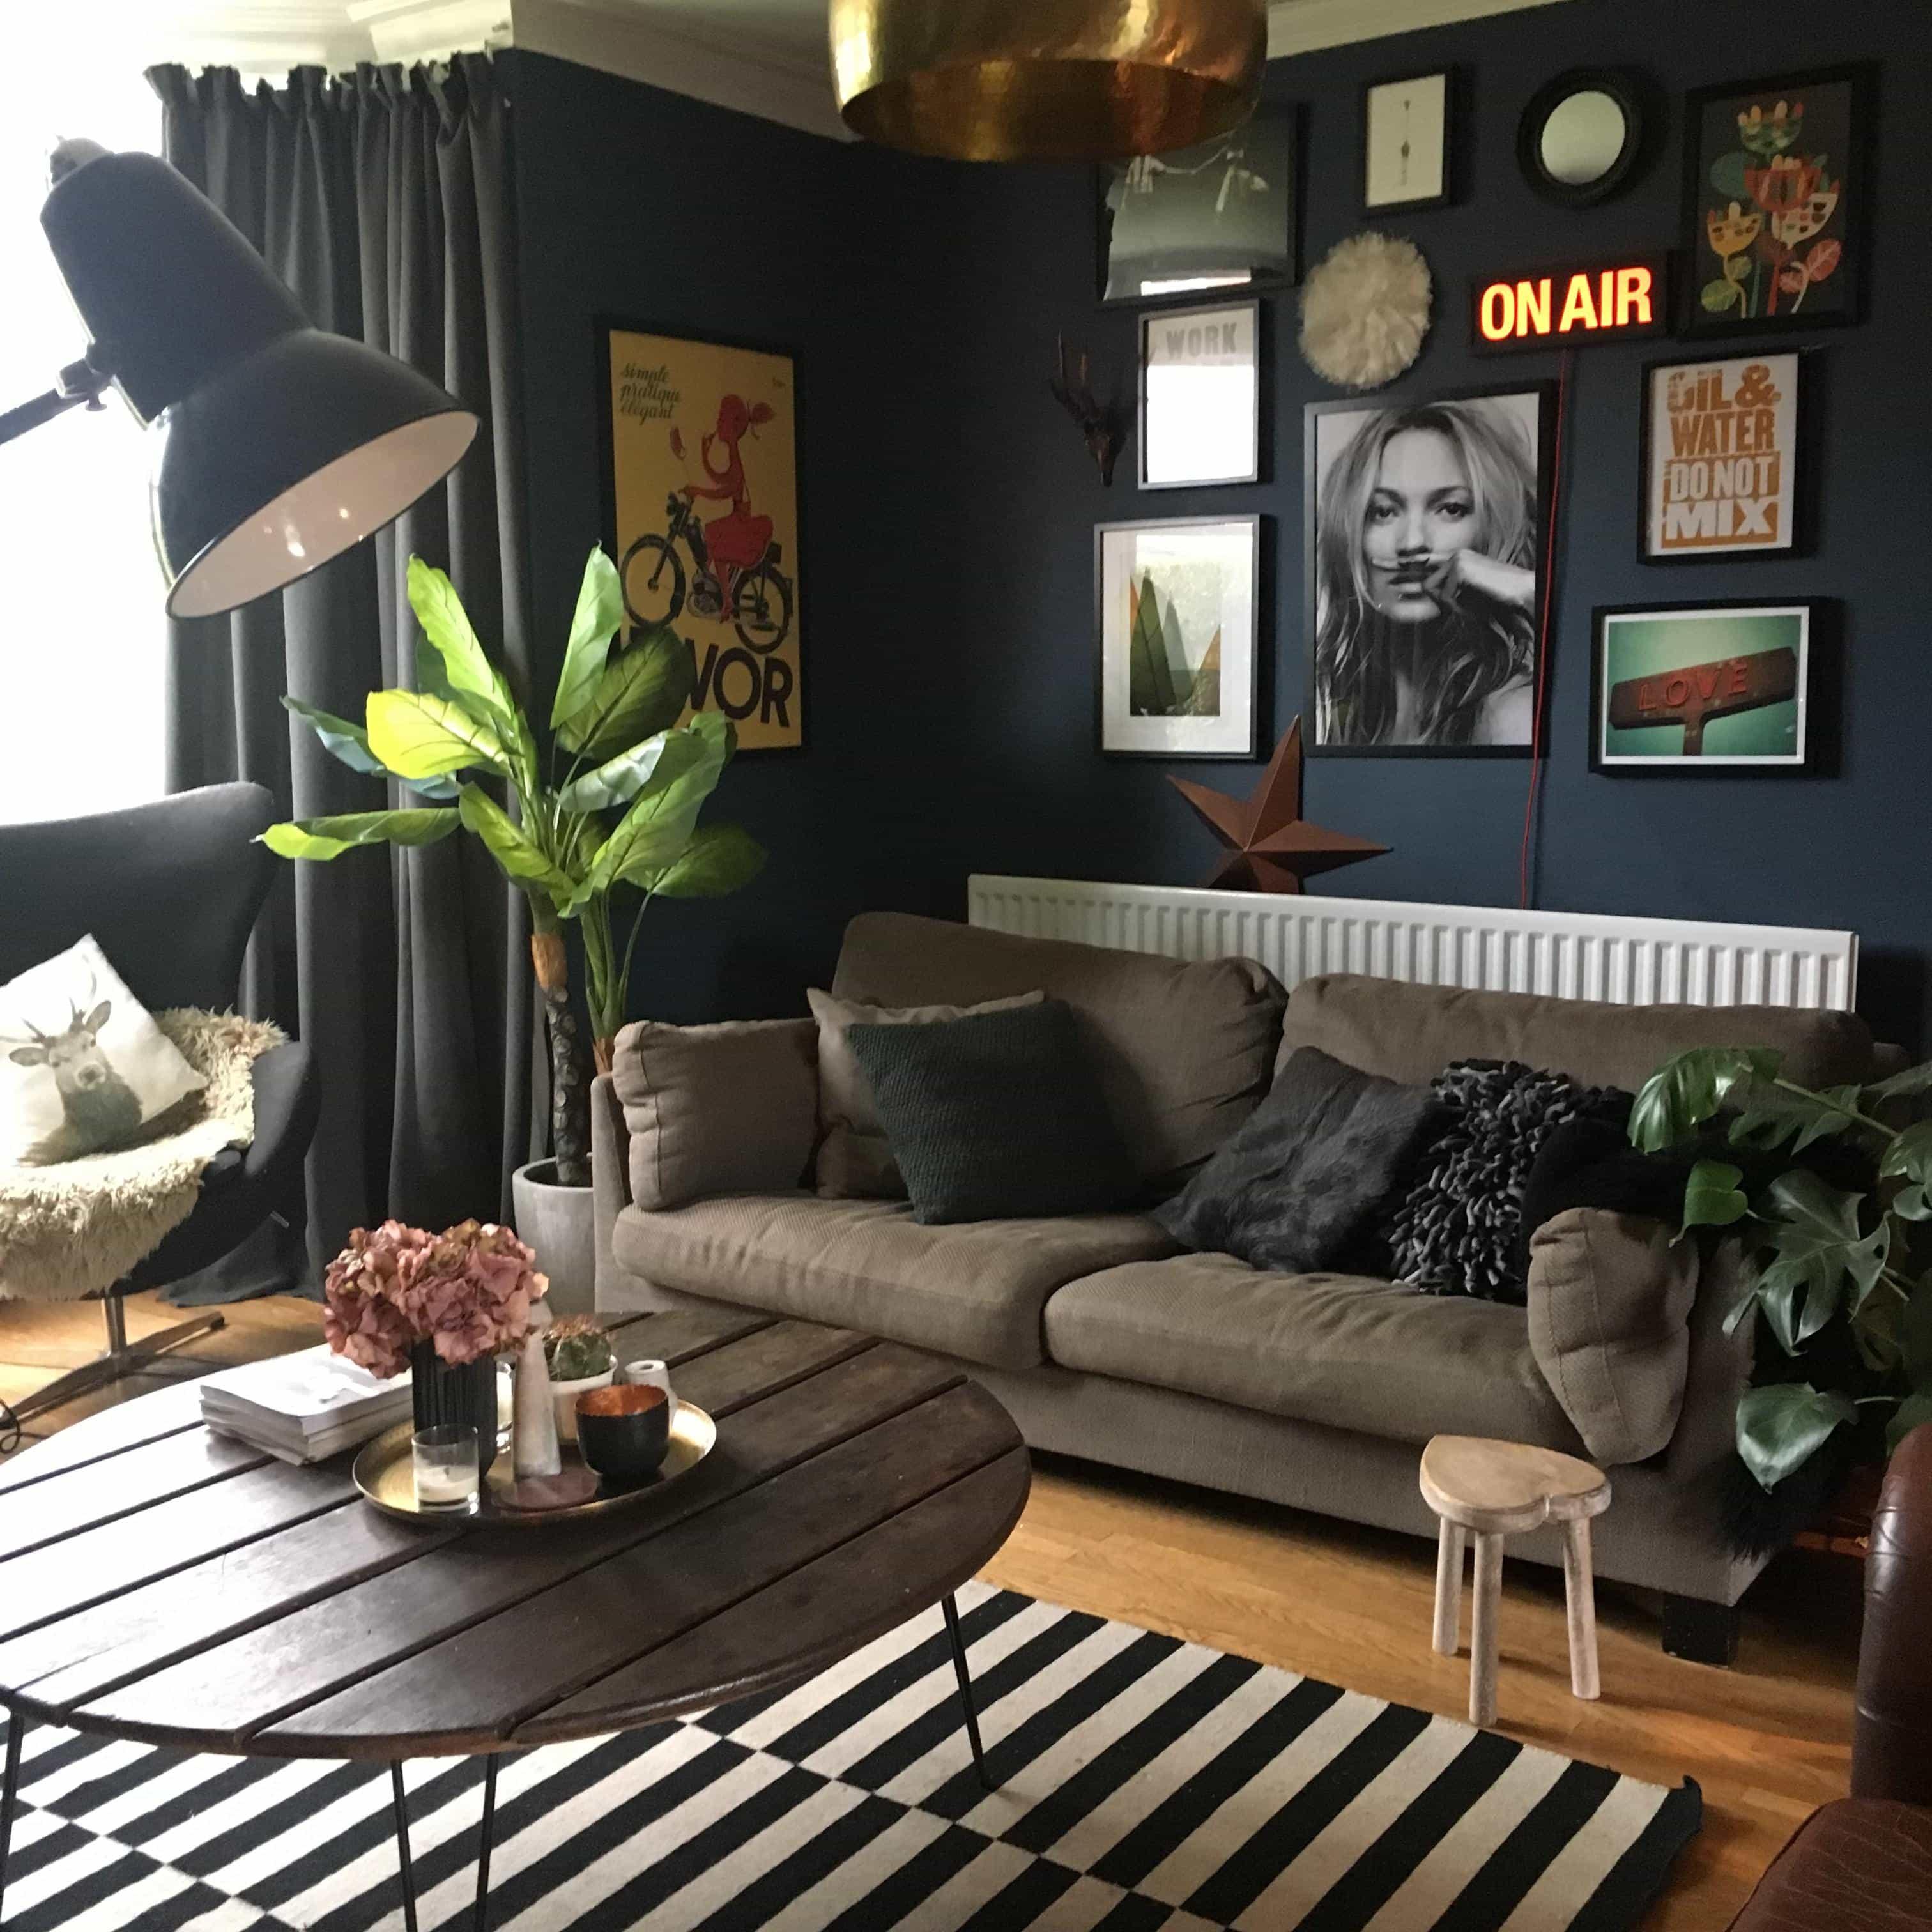 Living room, dark walls, stiff key blue